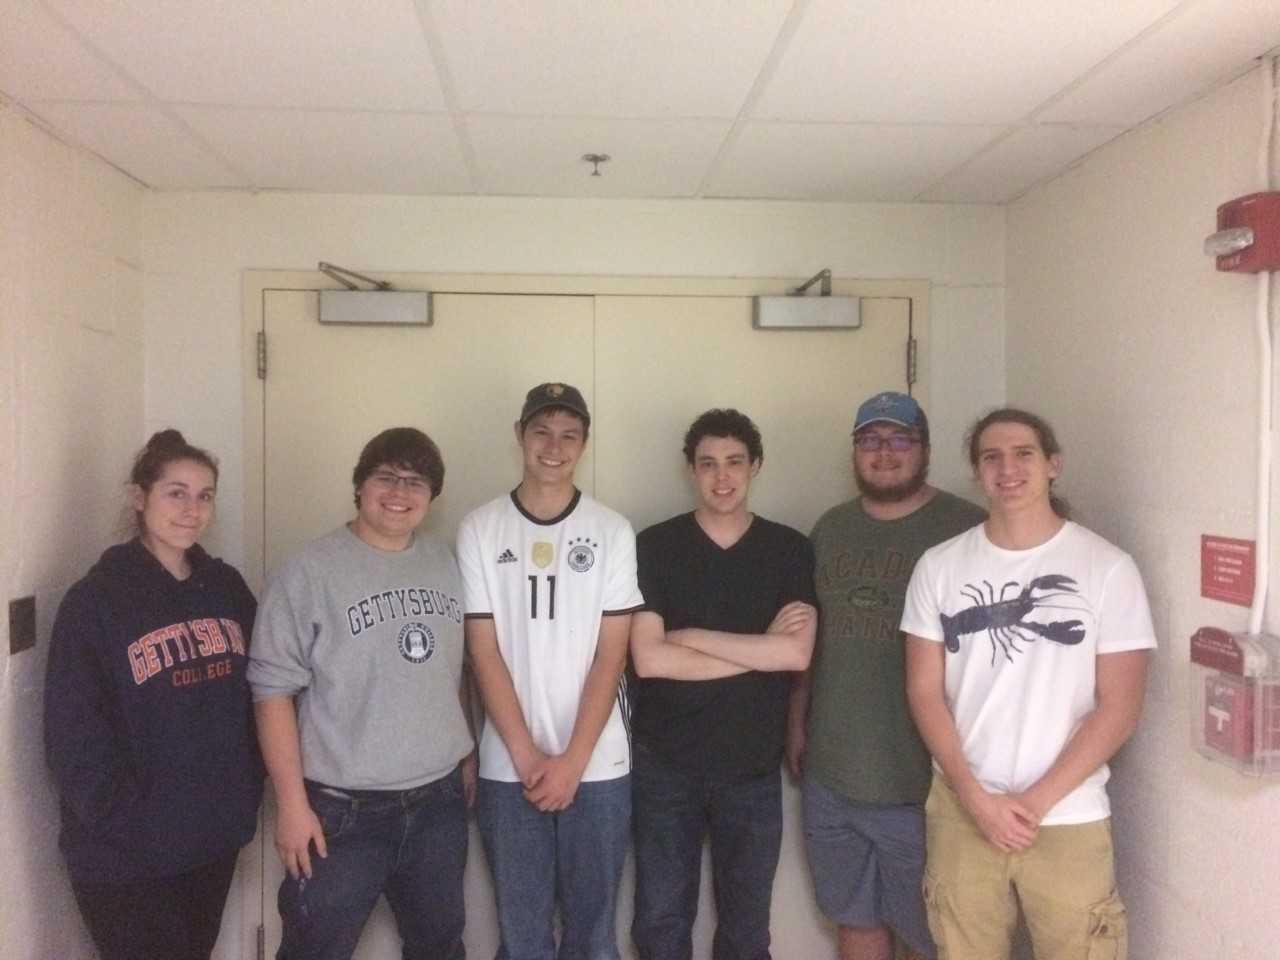 Gettysburg College's Quiz Bowl members, from left to right: Nikita Johnson '22, Eli Morton '21, Ryan Bilger '19, Danny Greenblatt '19 Austin Mowers '19 Ryzeson Maravich '22 (Photo Ryan Bilger/The Gettysburgian)